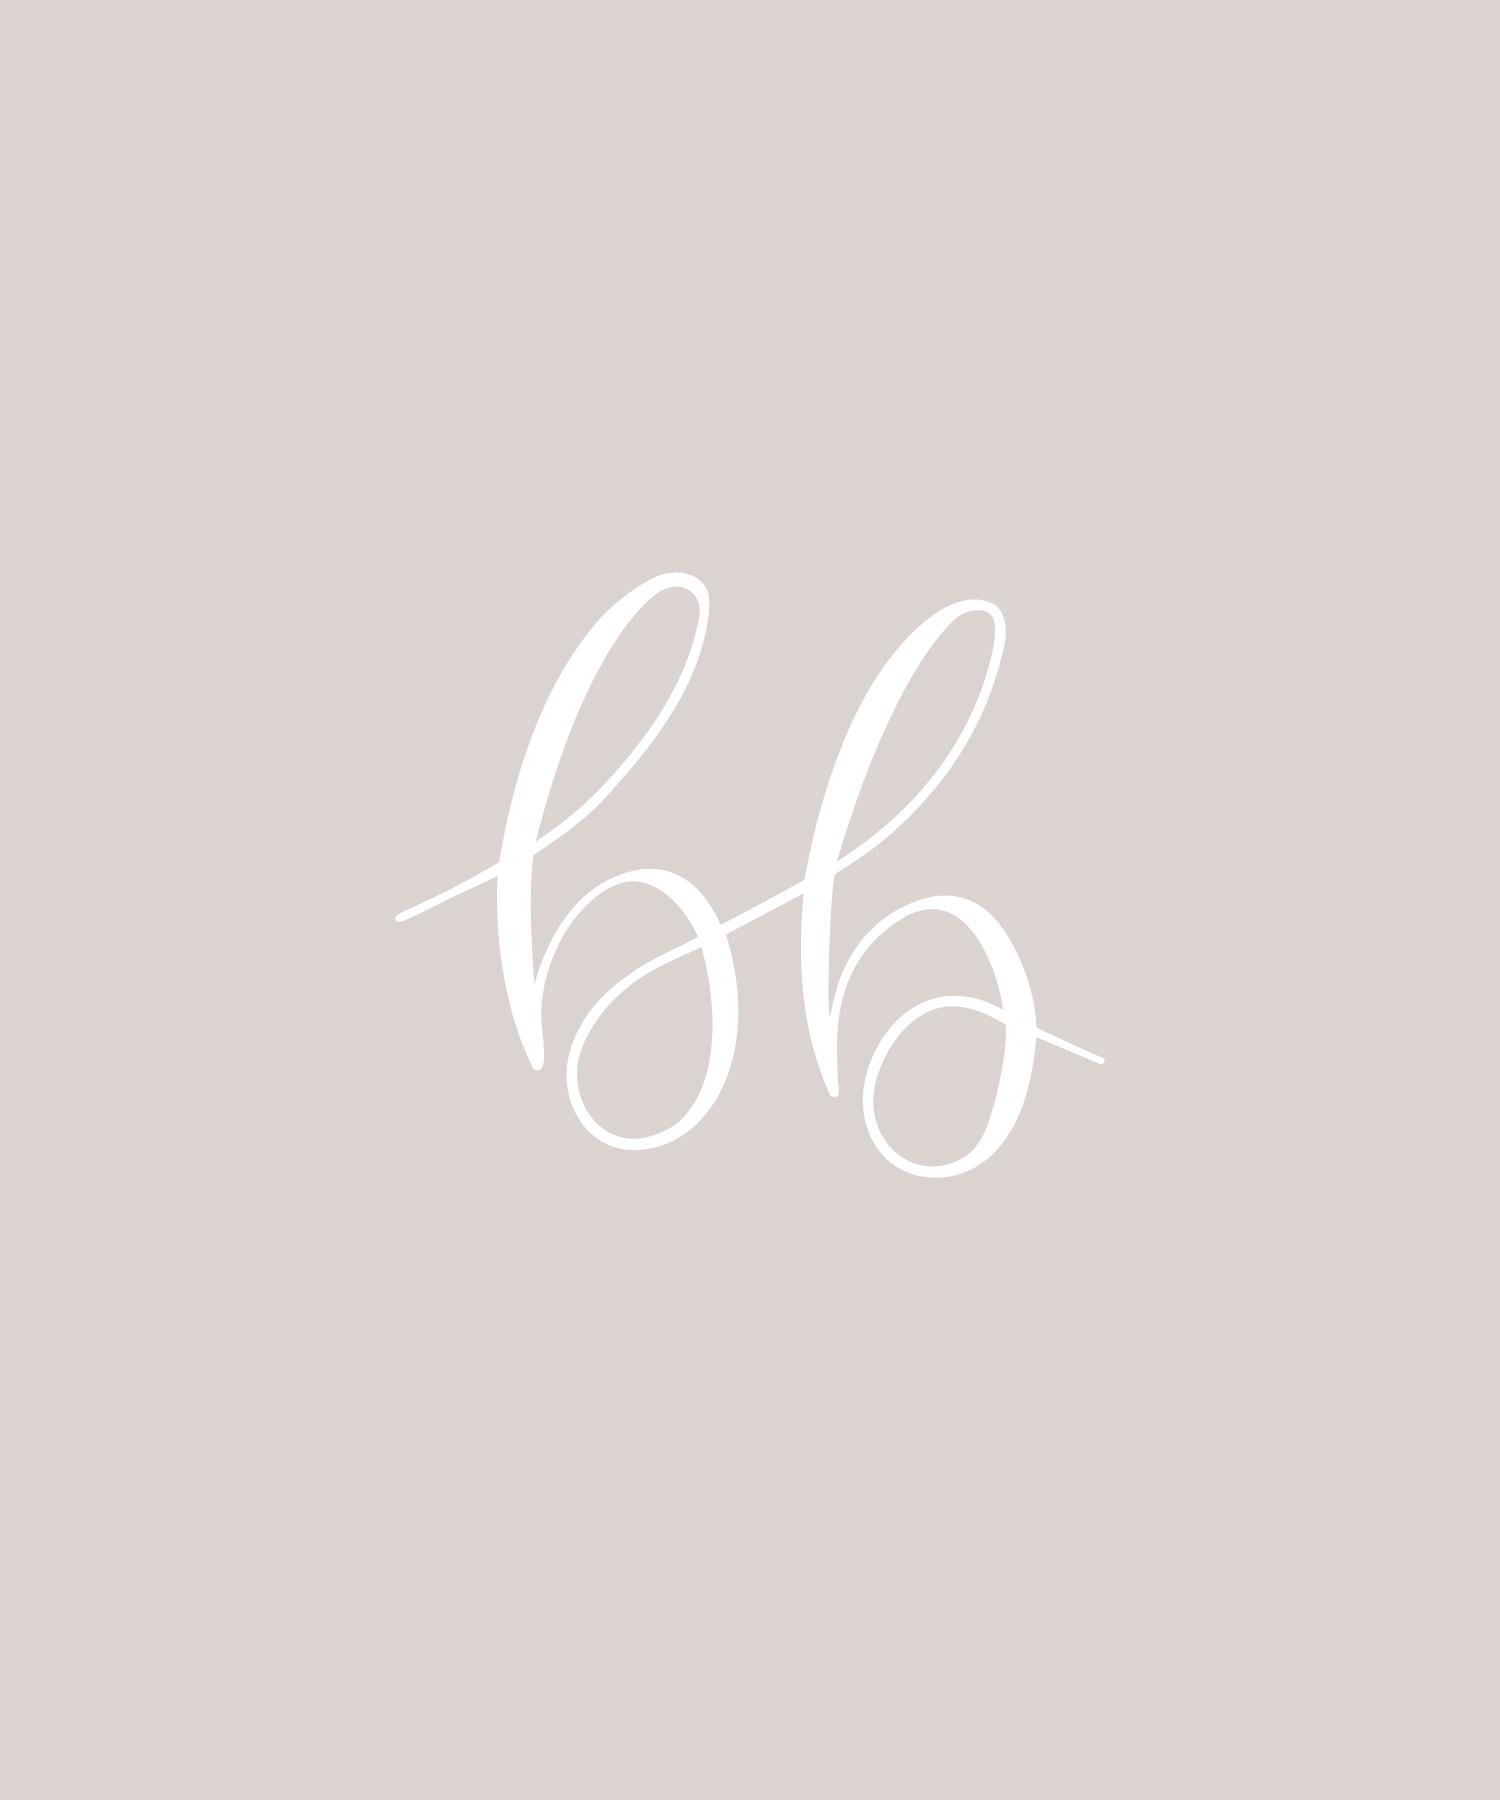 Logo & Branding by Bea & Bloom Creative Design Studio